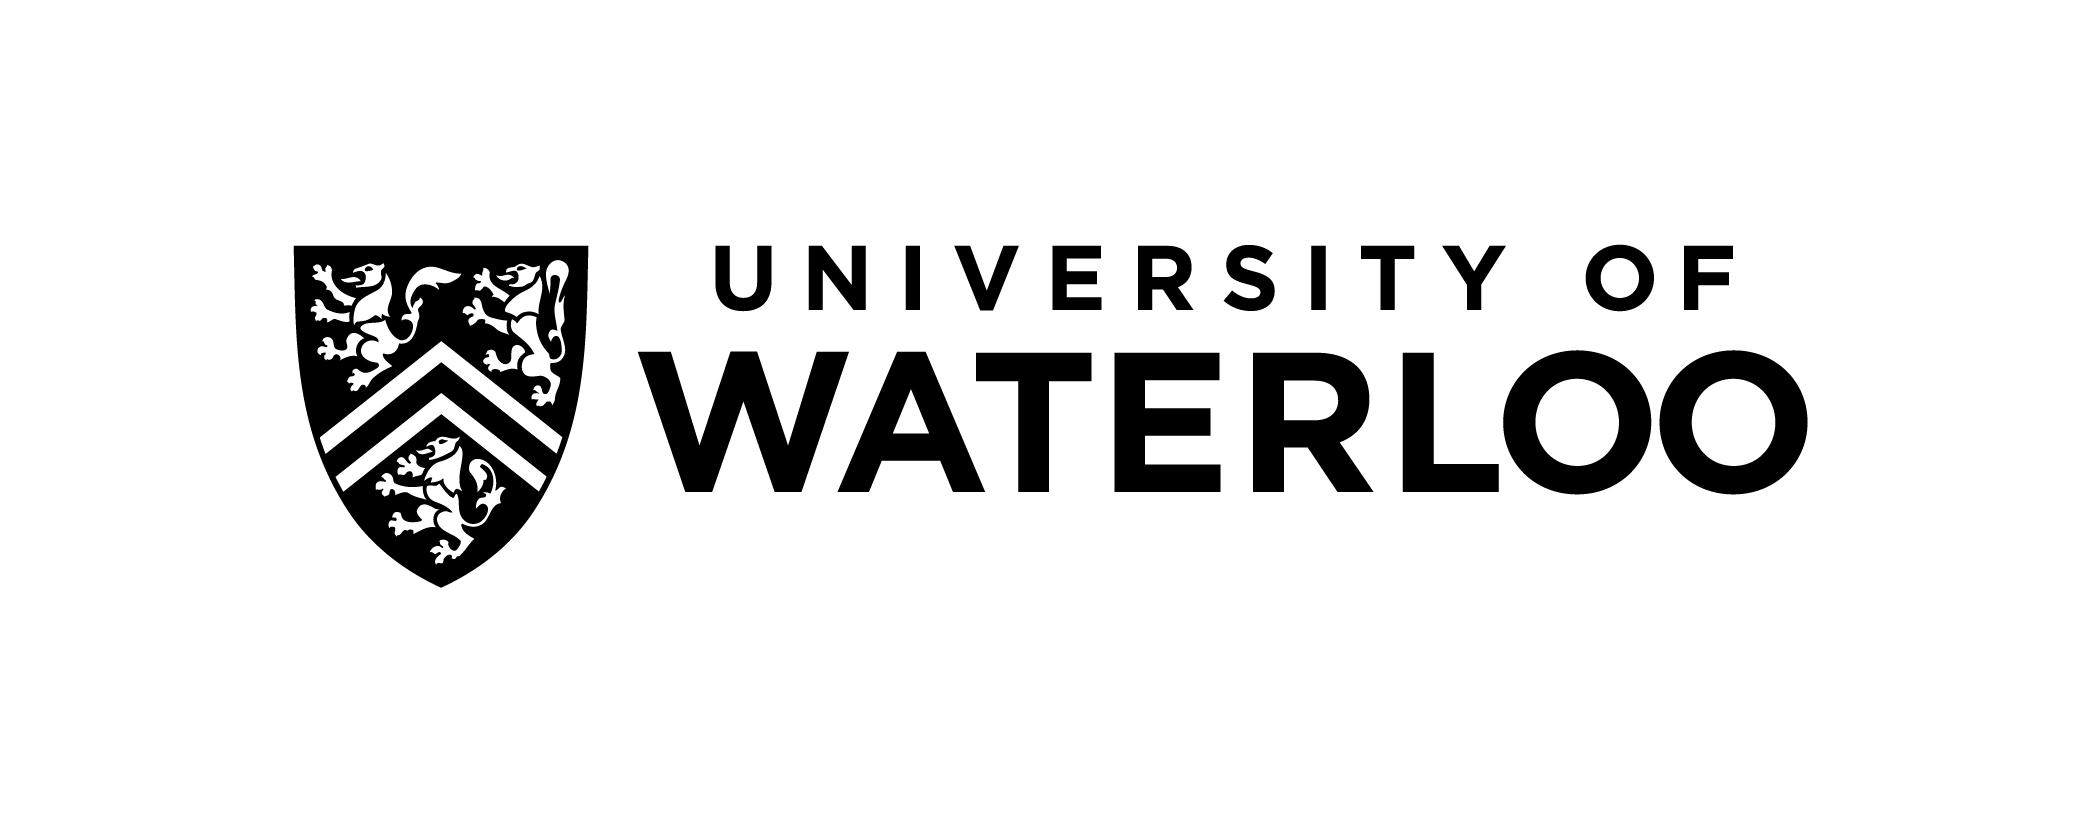 UniversityOfWaterloo_logo_horiz_bk.jpg